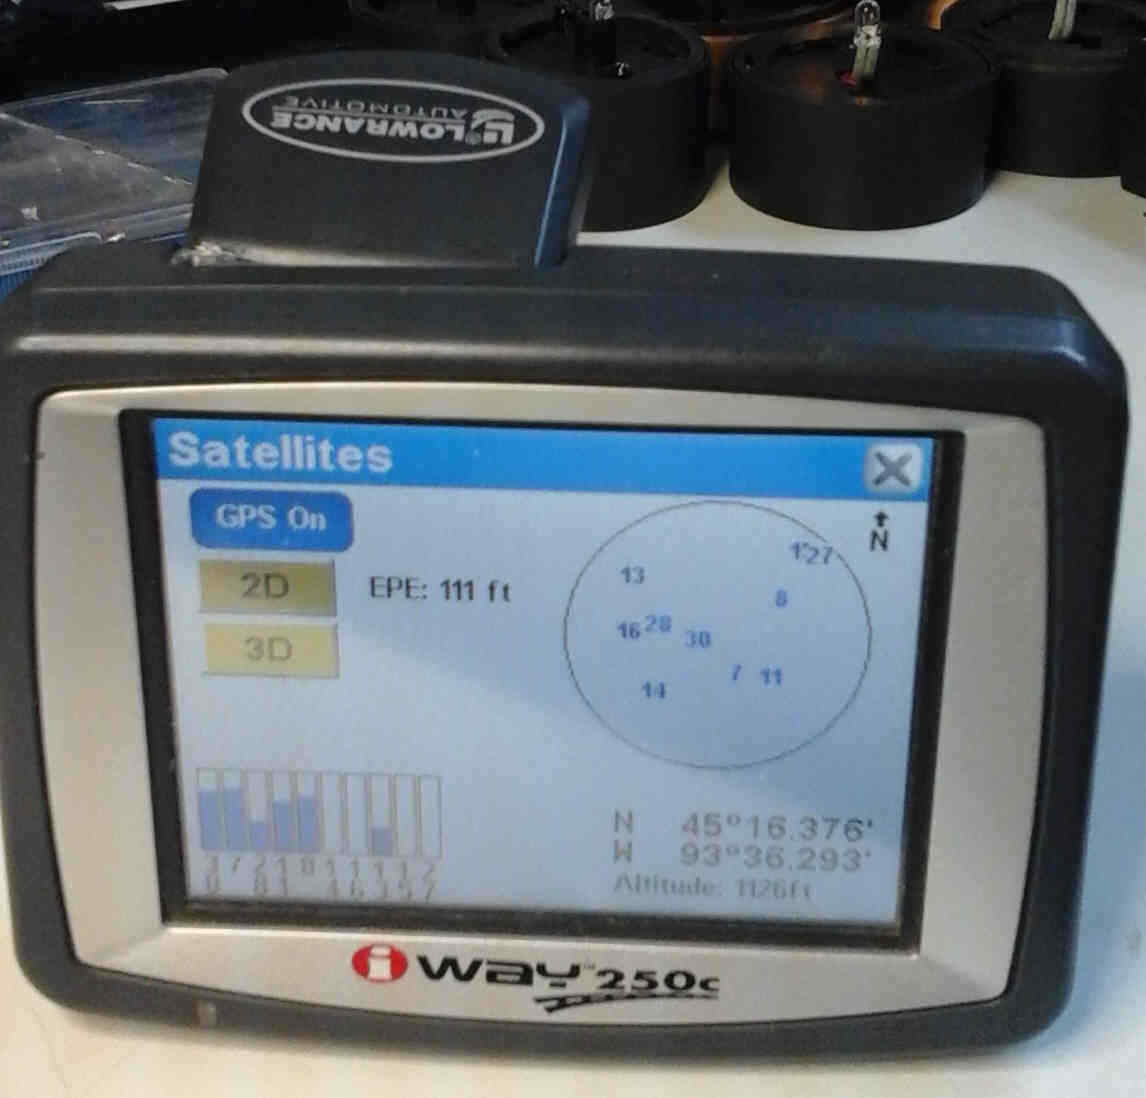 Lowrance iWay 250C 3.5-Inch Portable GPS